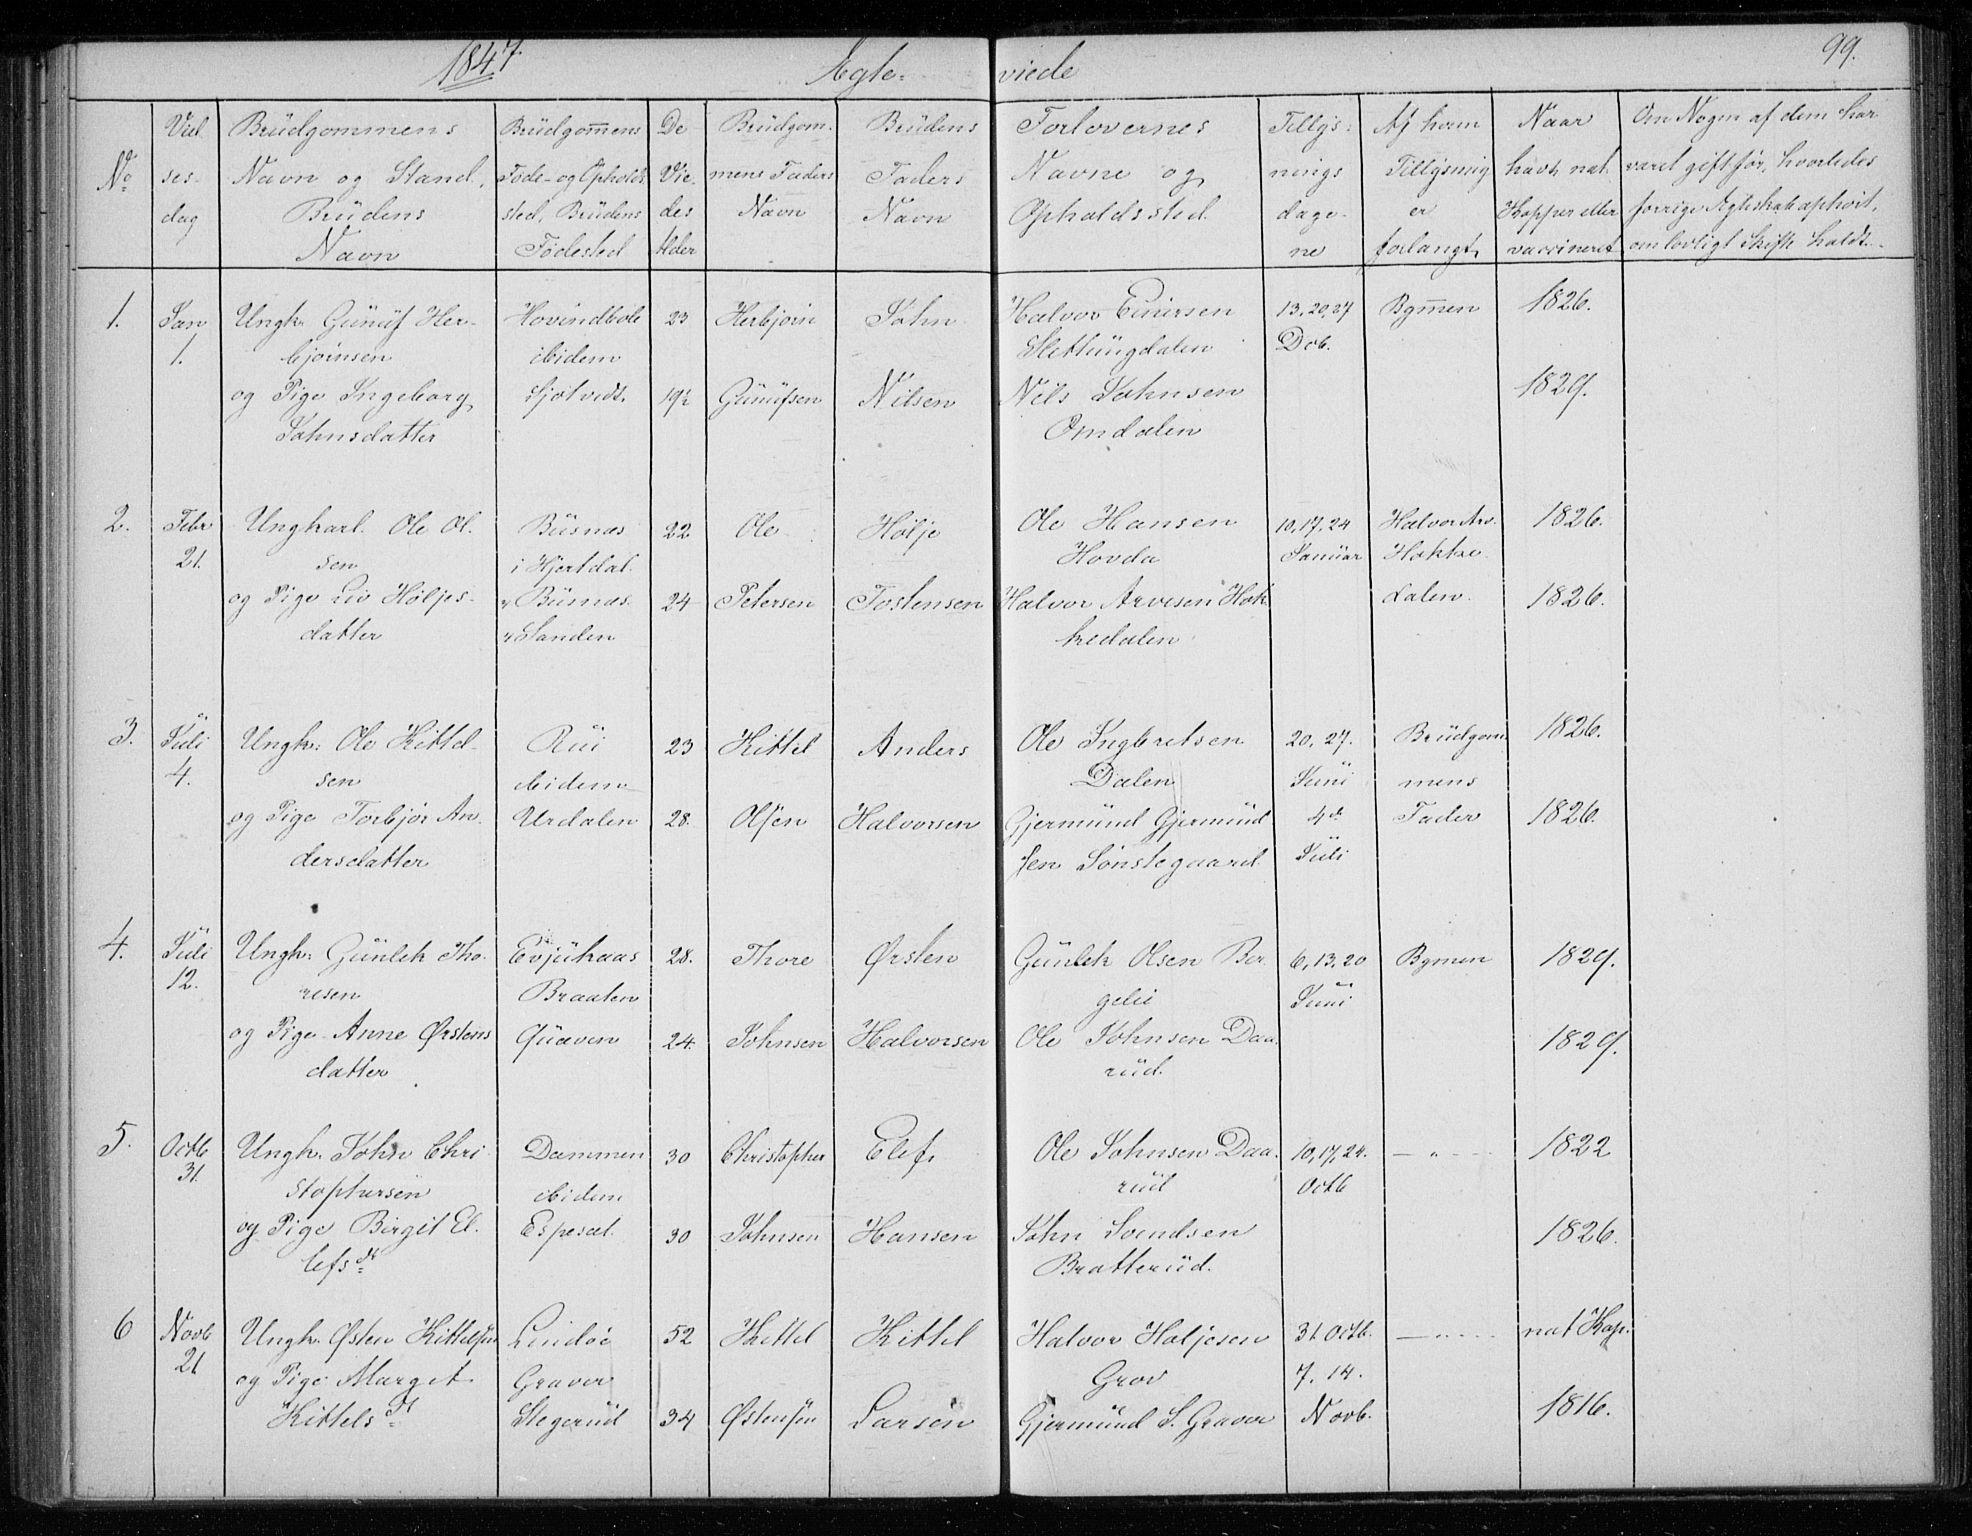 SAKO, Gransherad kirkebøker, F/Fb/L0003: Ministerialbok nr. II 3, 1844-1859, s. 99